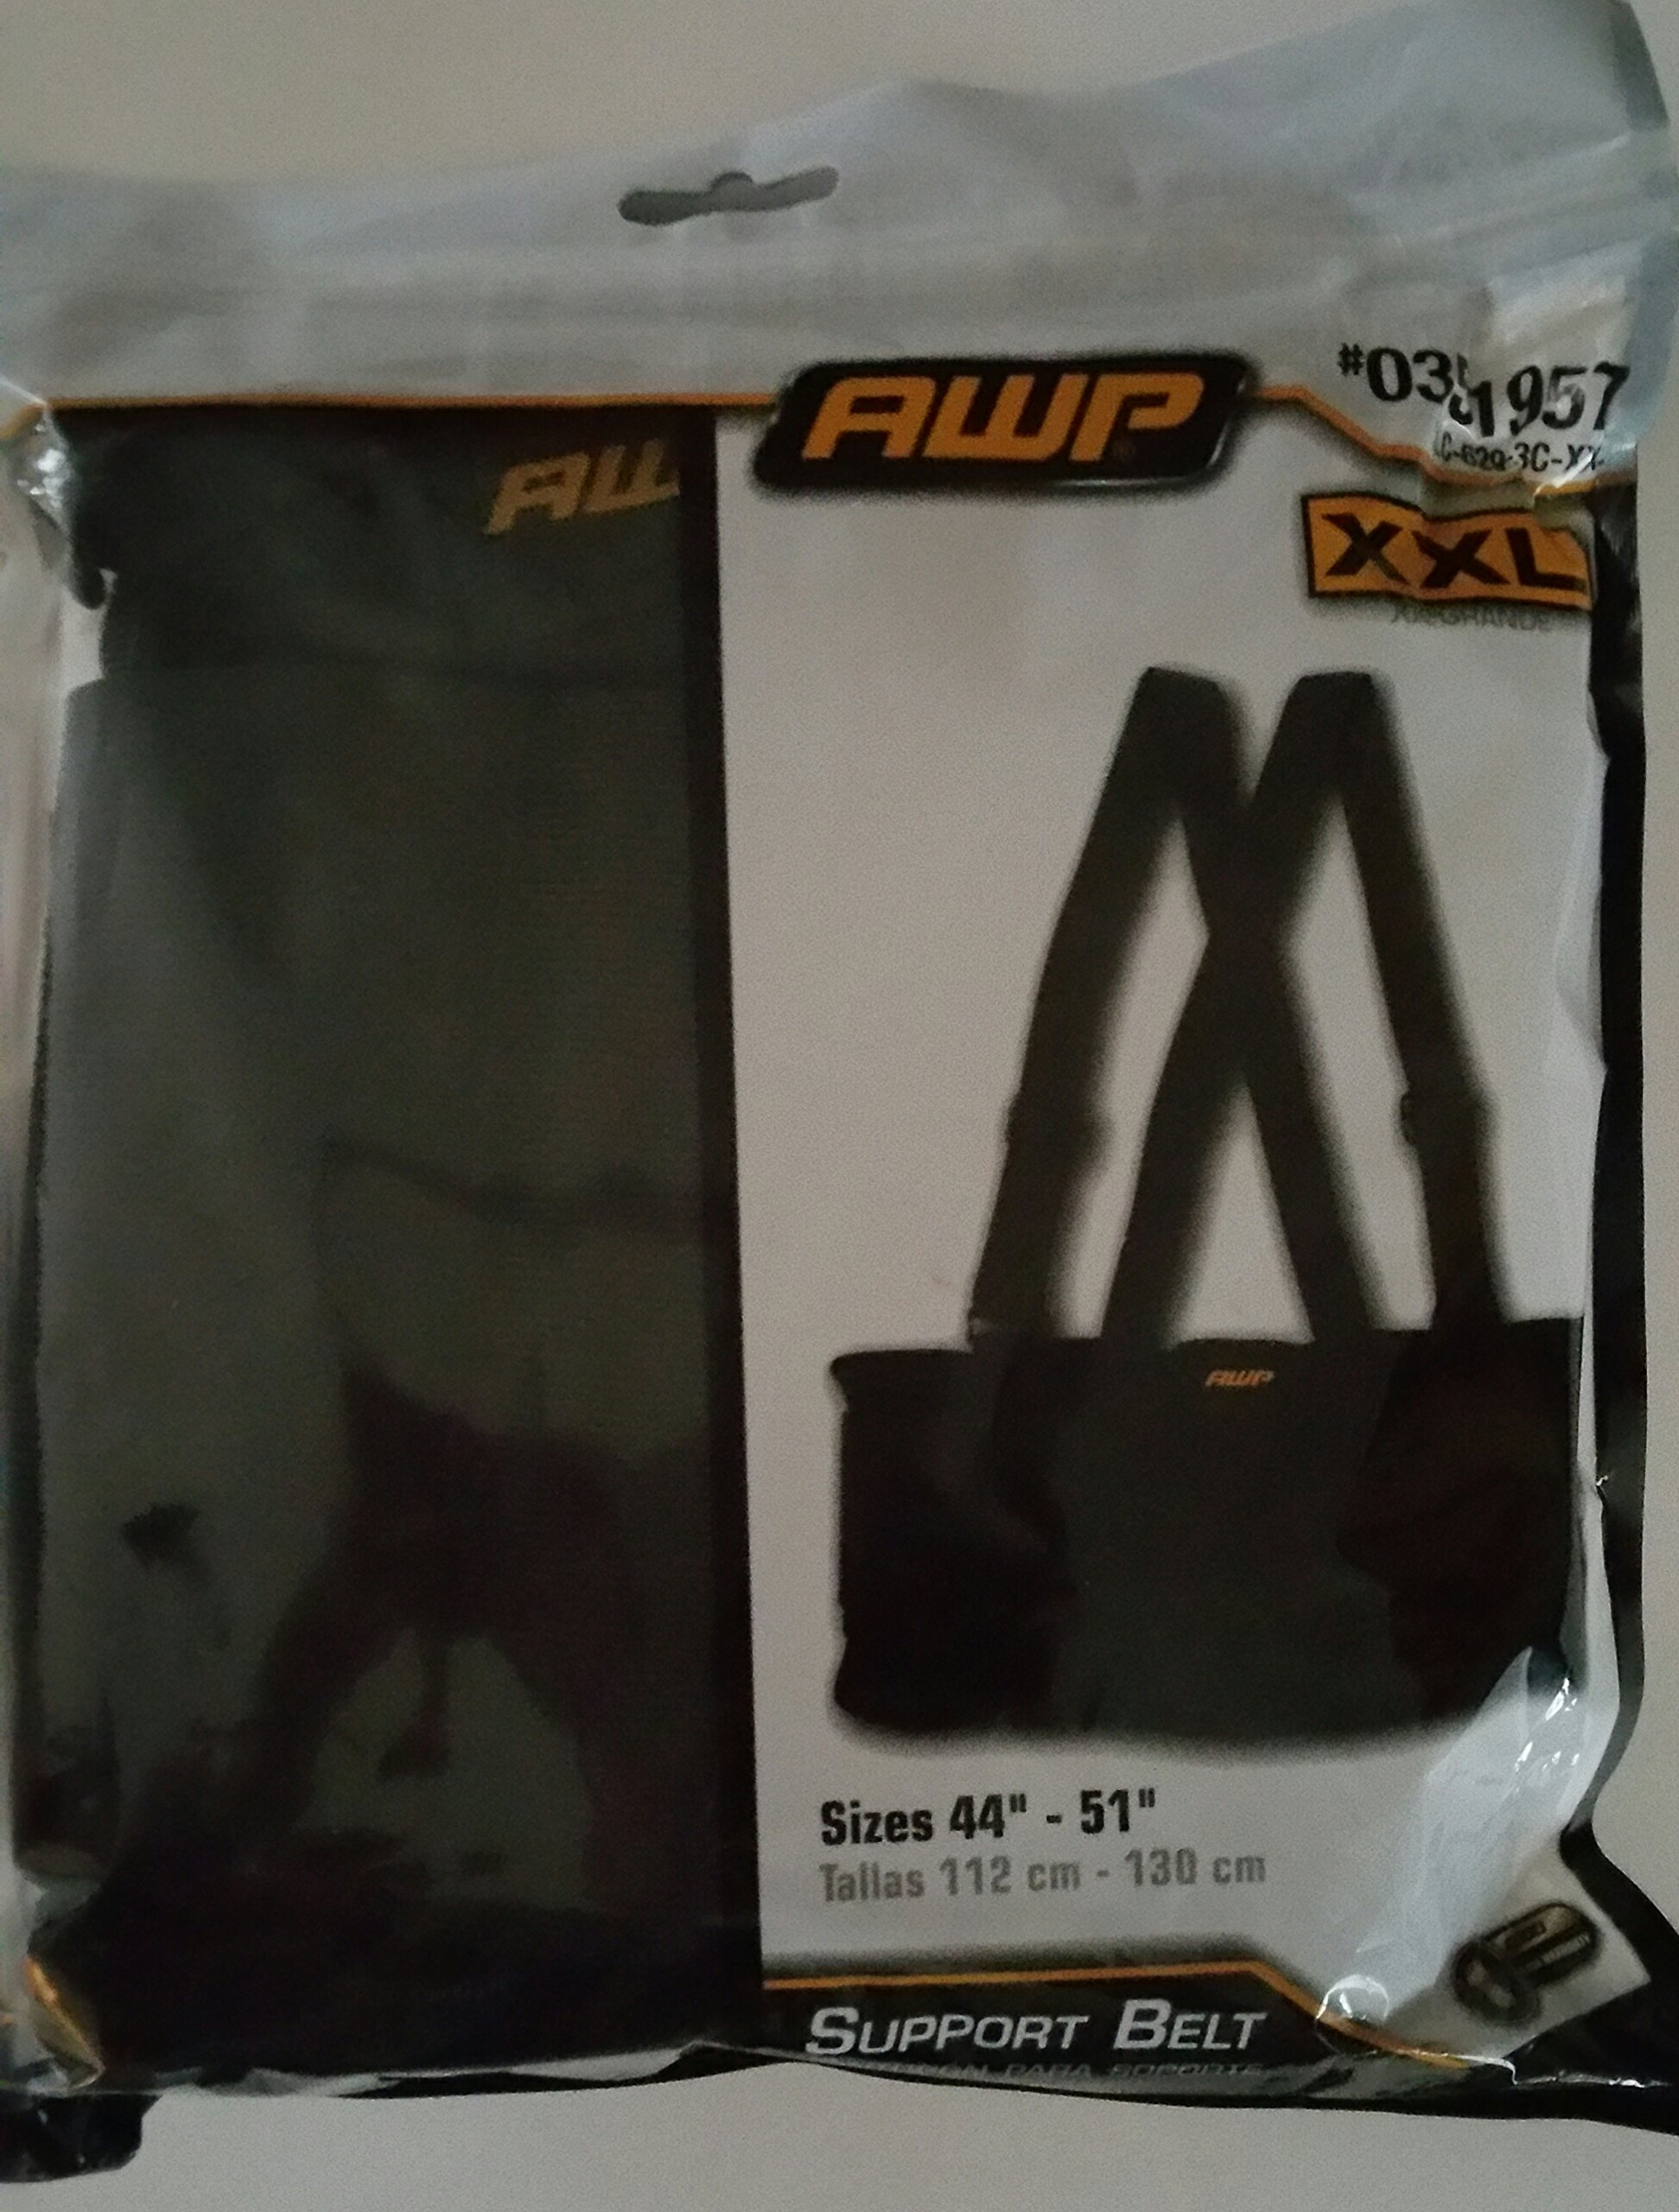 AWP Black XXL Back Support Belt for Sizes 44'' - 51'' 0351957